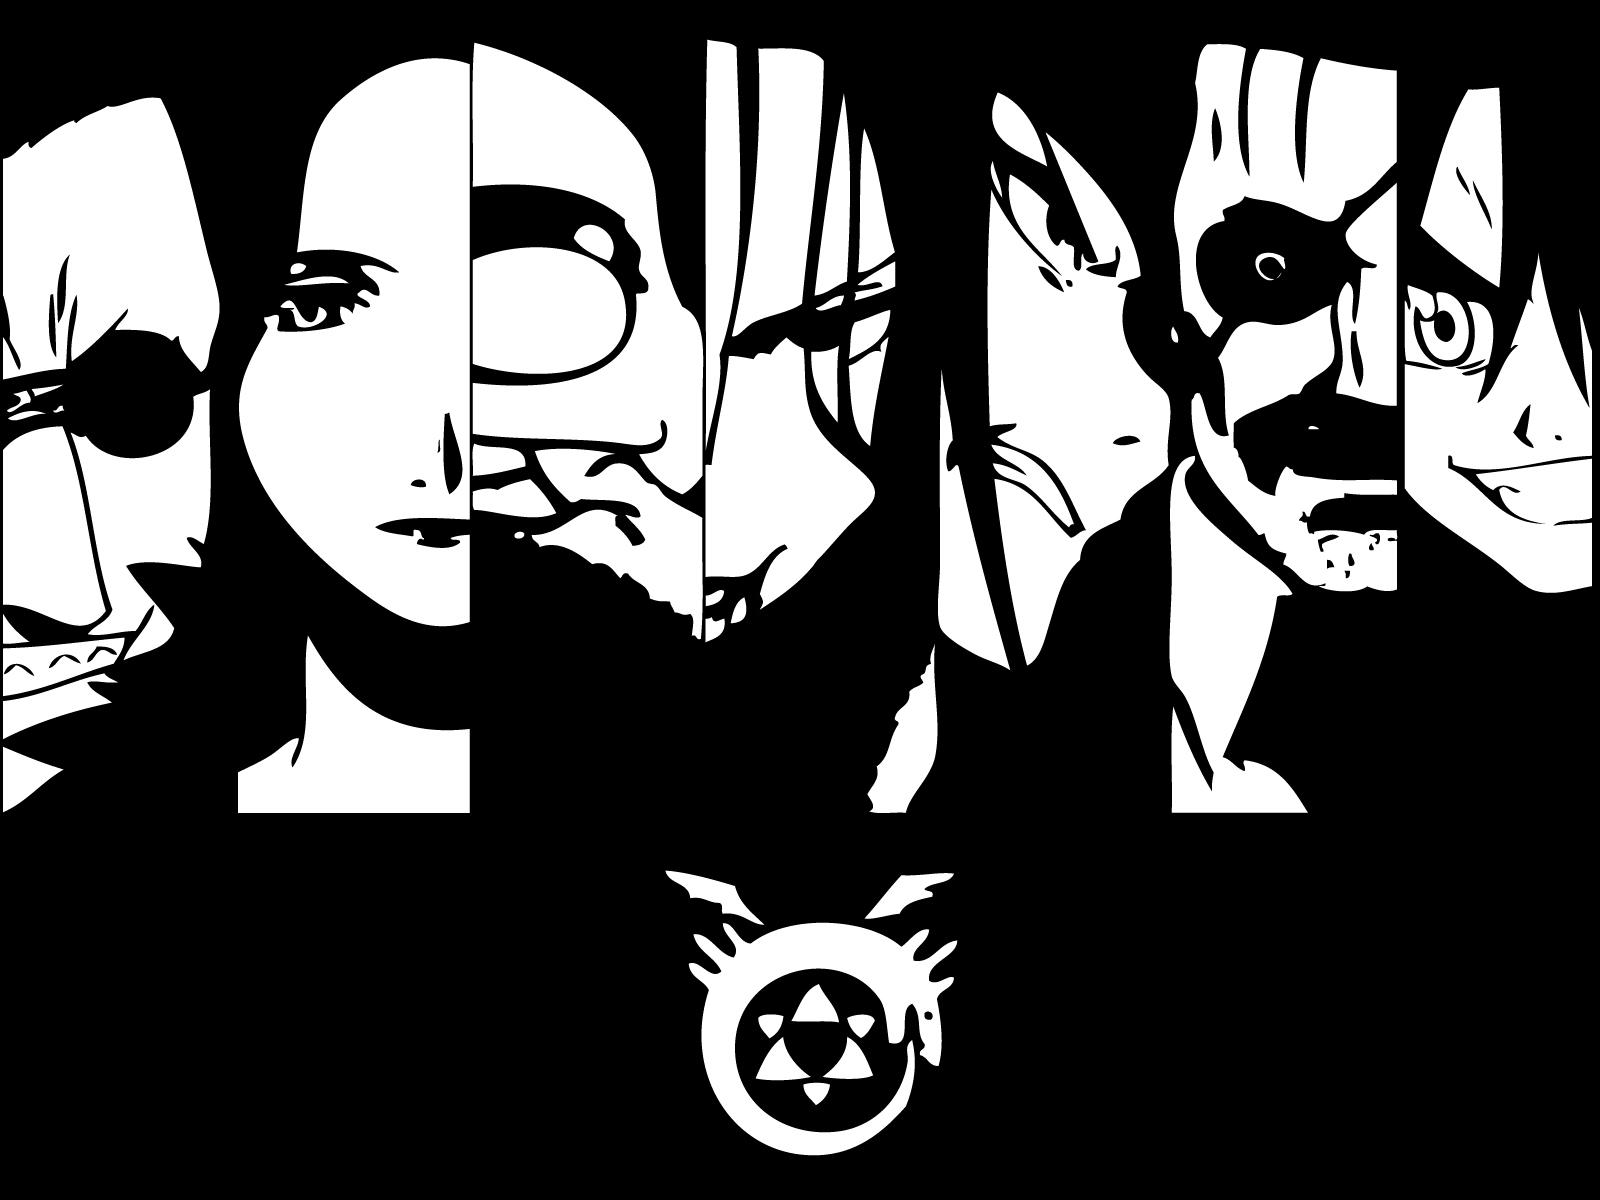 The Alchemist Quotes Wallpaper Hd Fullmetal Alchemist Brotherhood Backgrounds